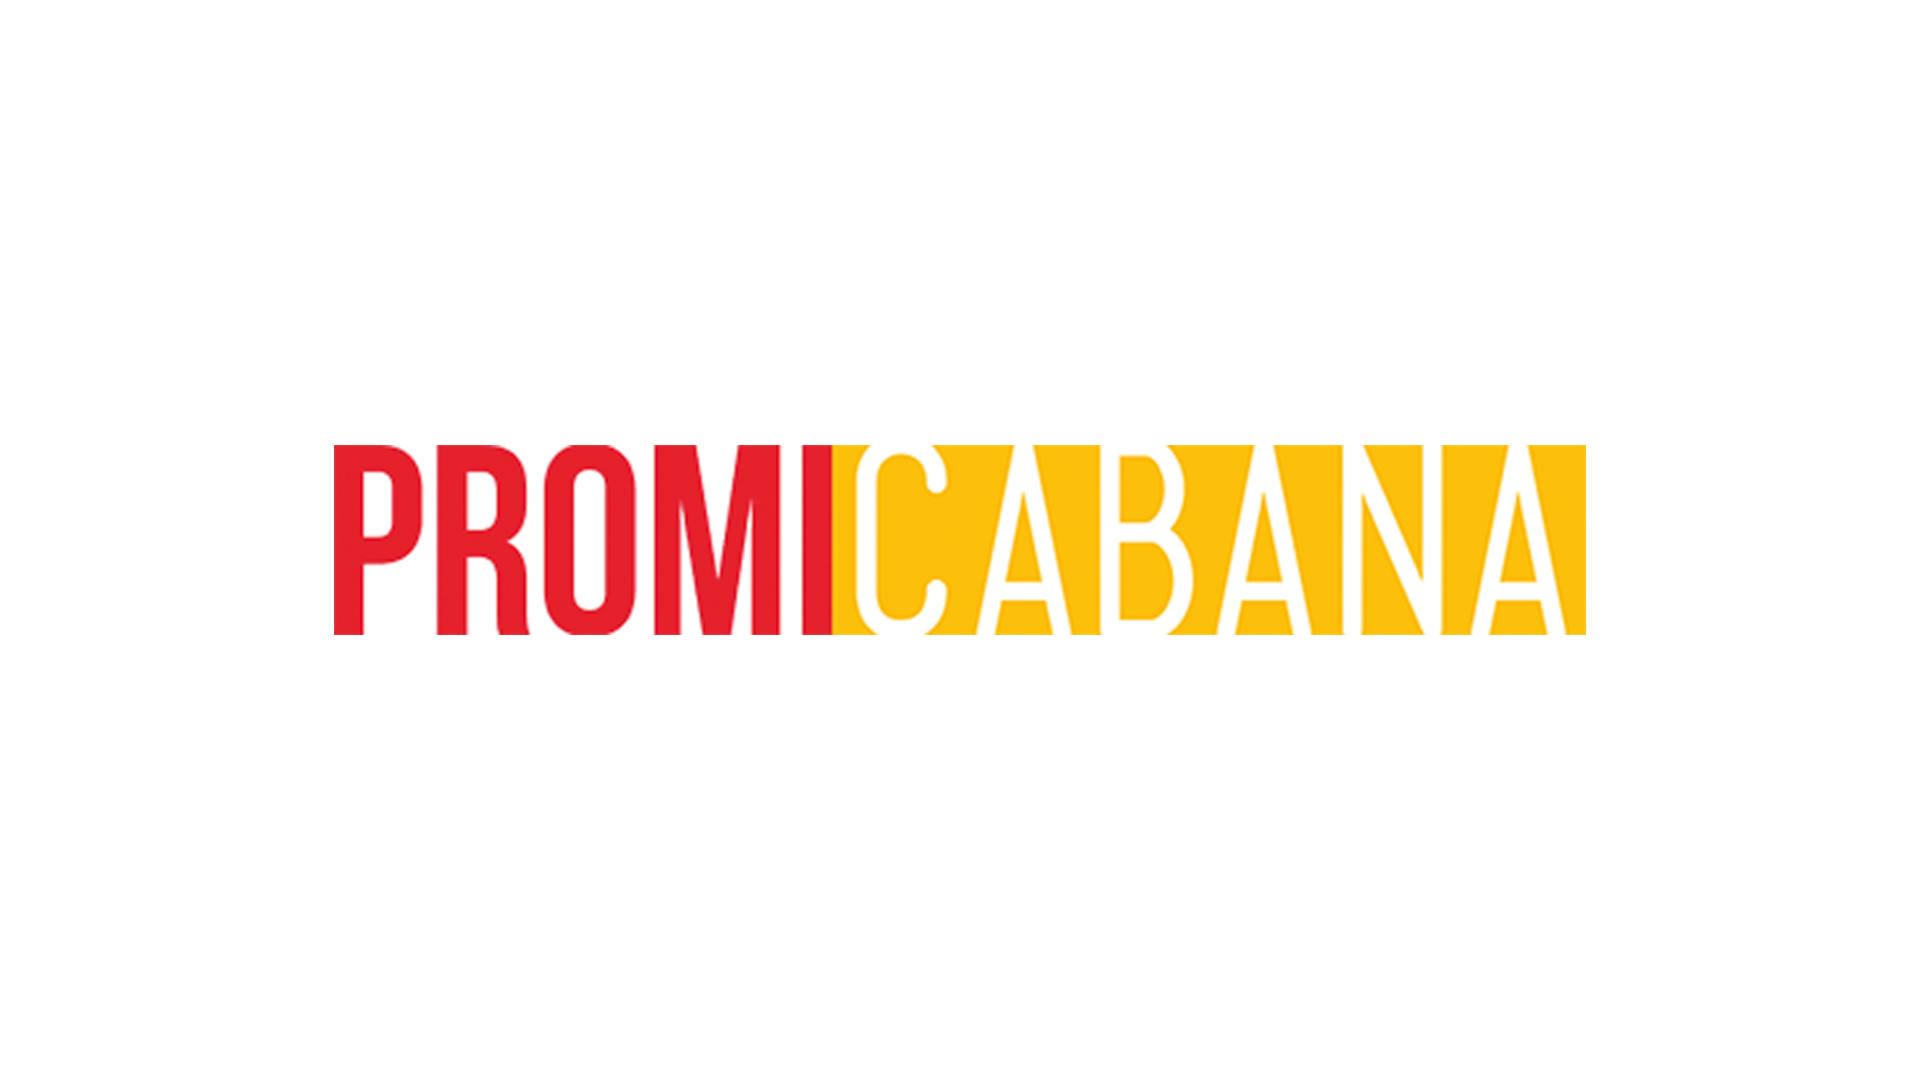 Matthew-McConaughey-Werbung-Lincoln-MKZ